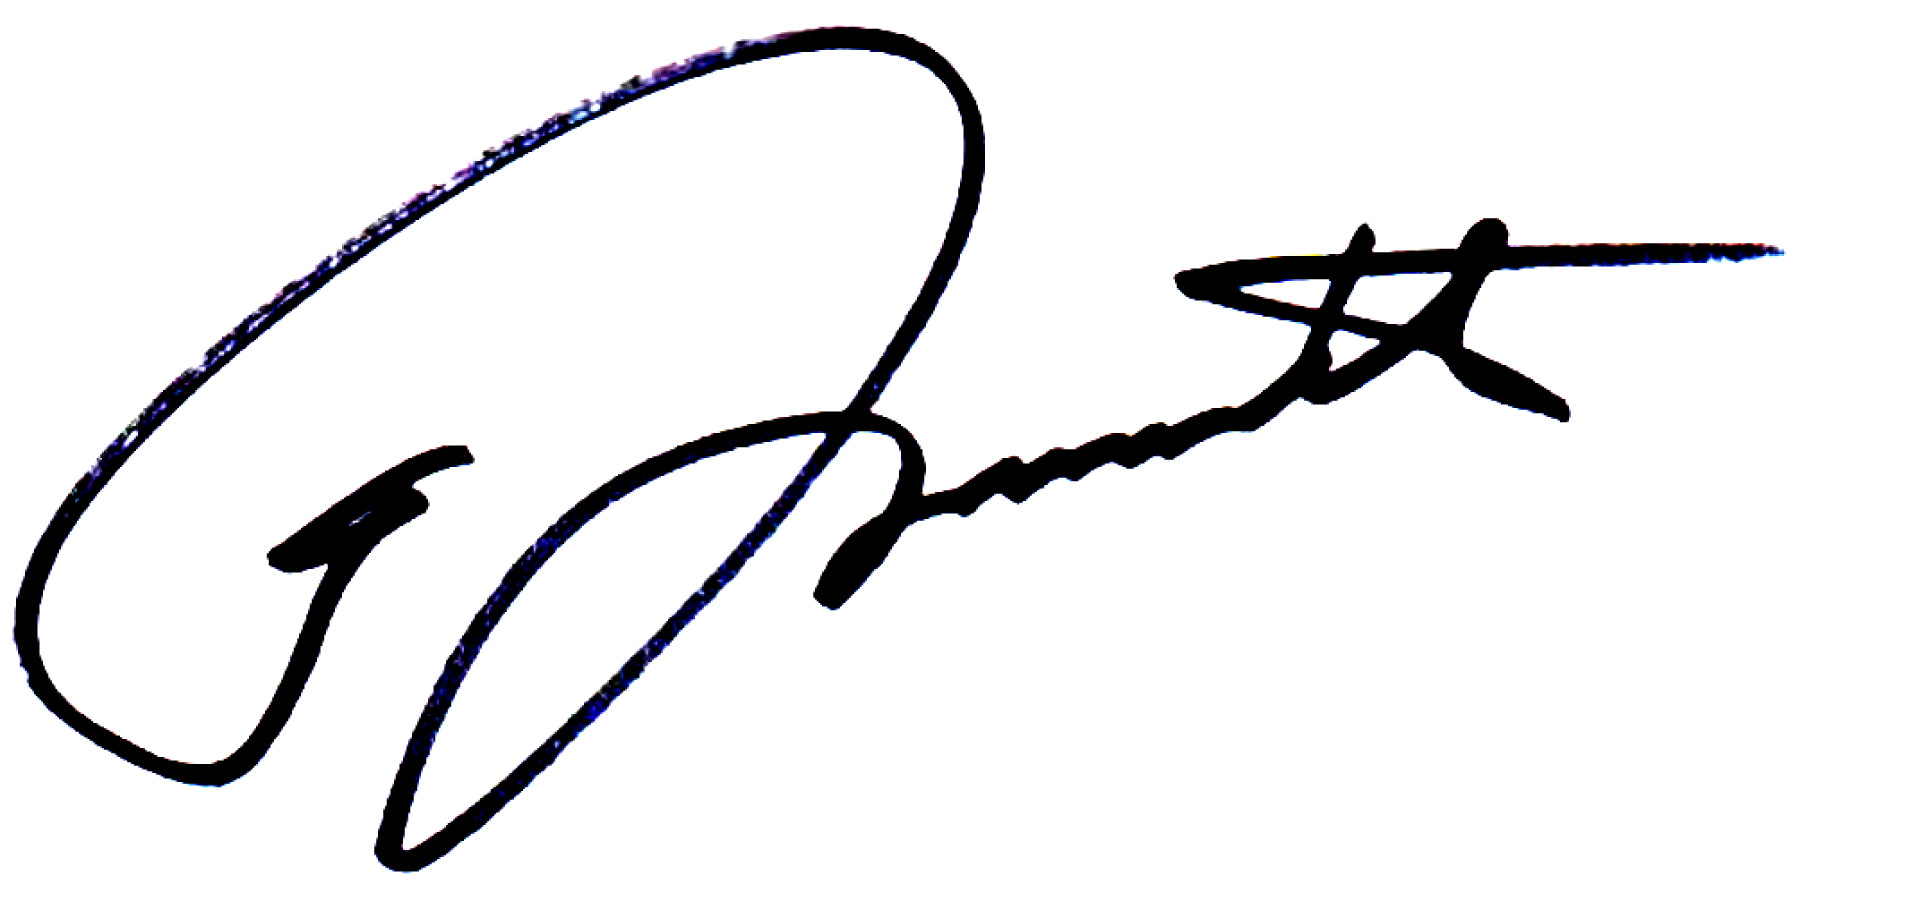 Wnbdesigns's Signature